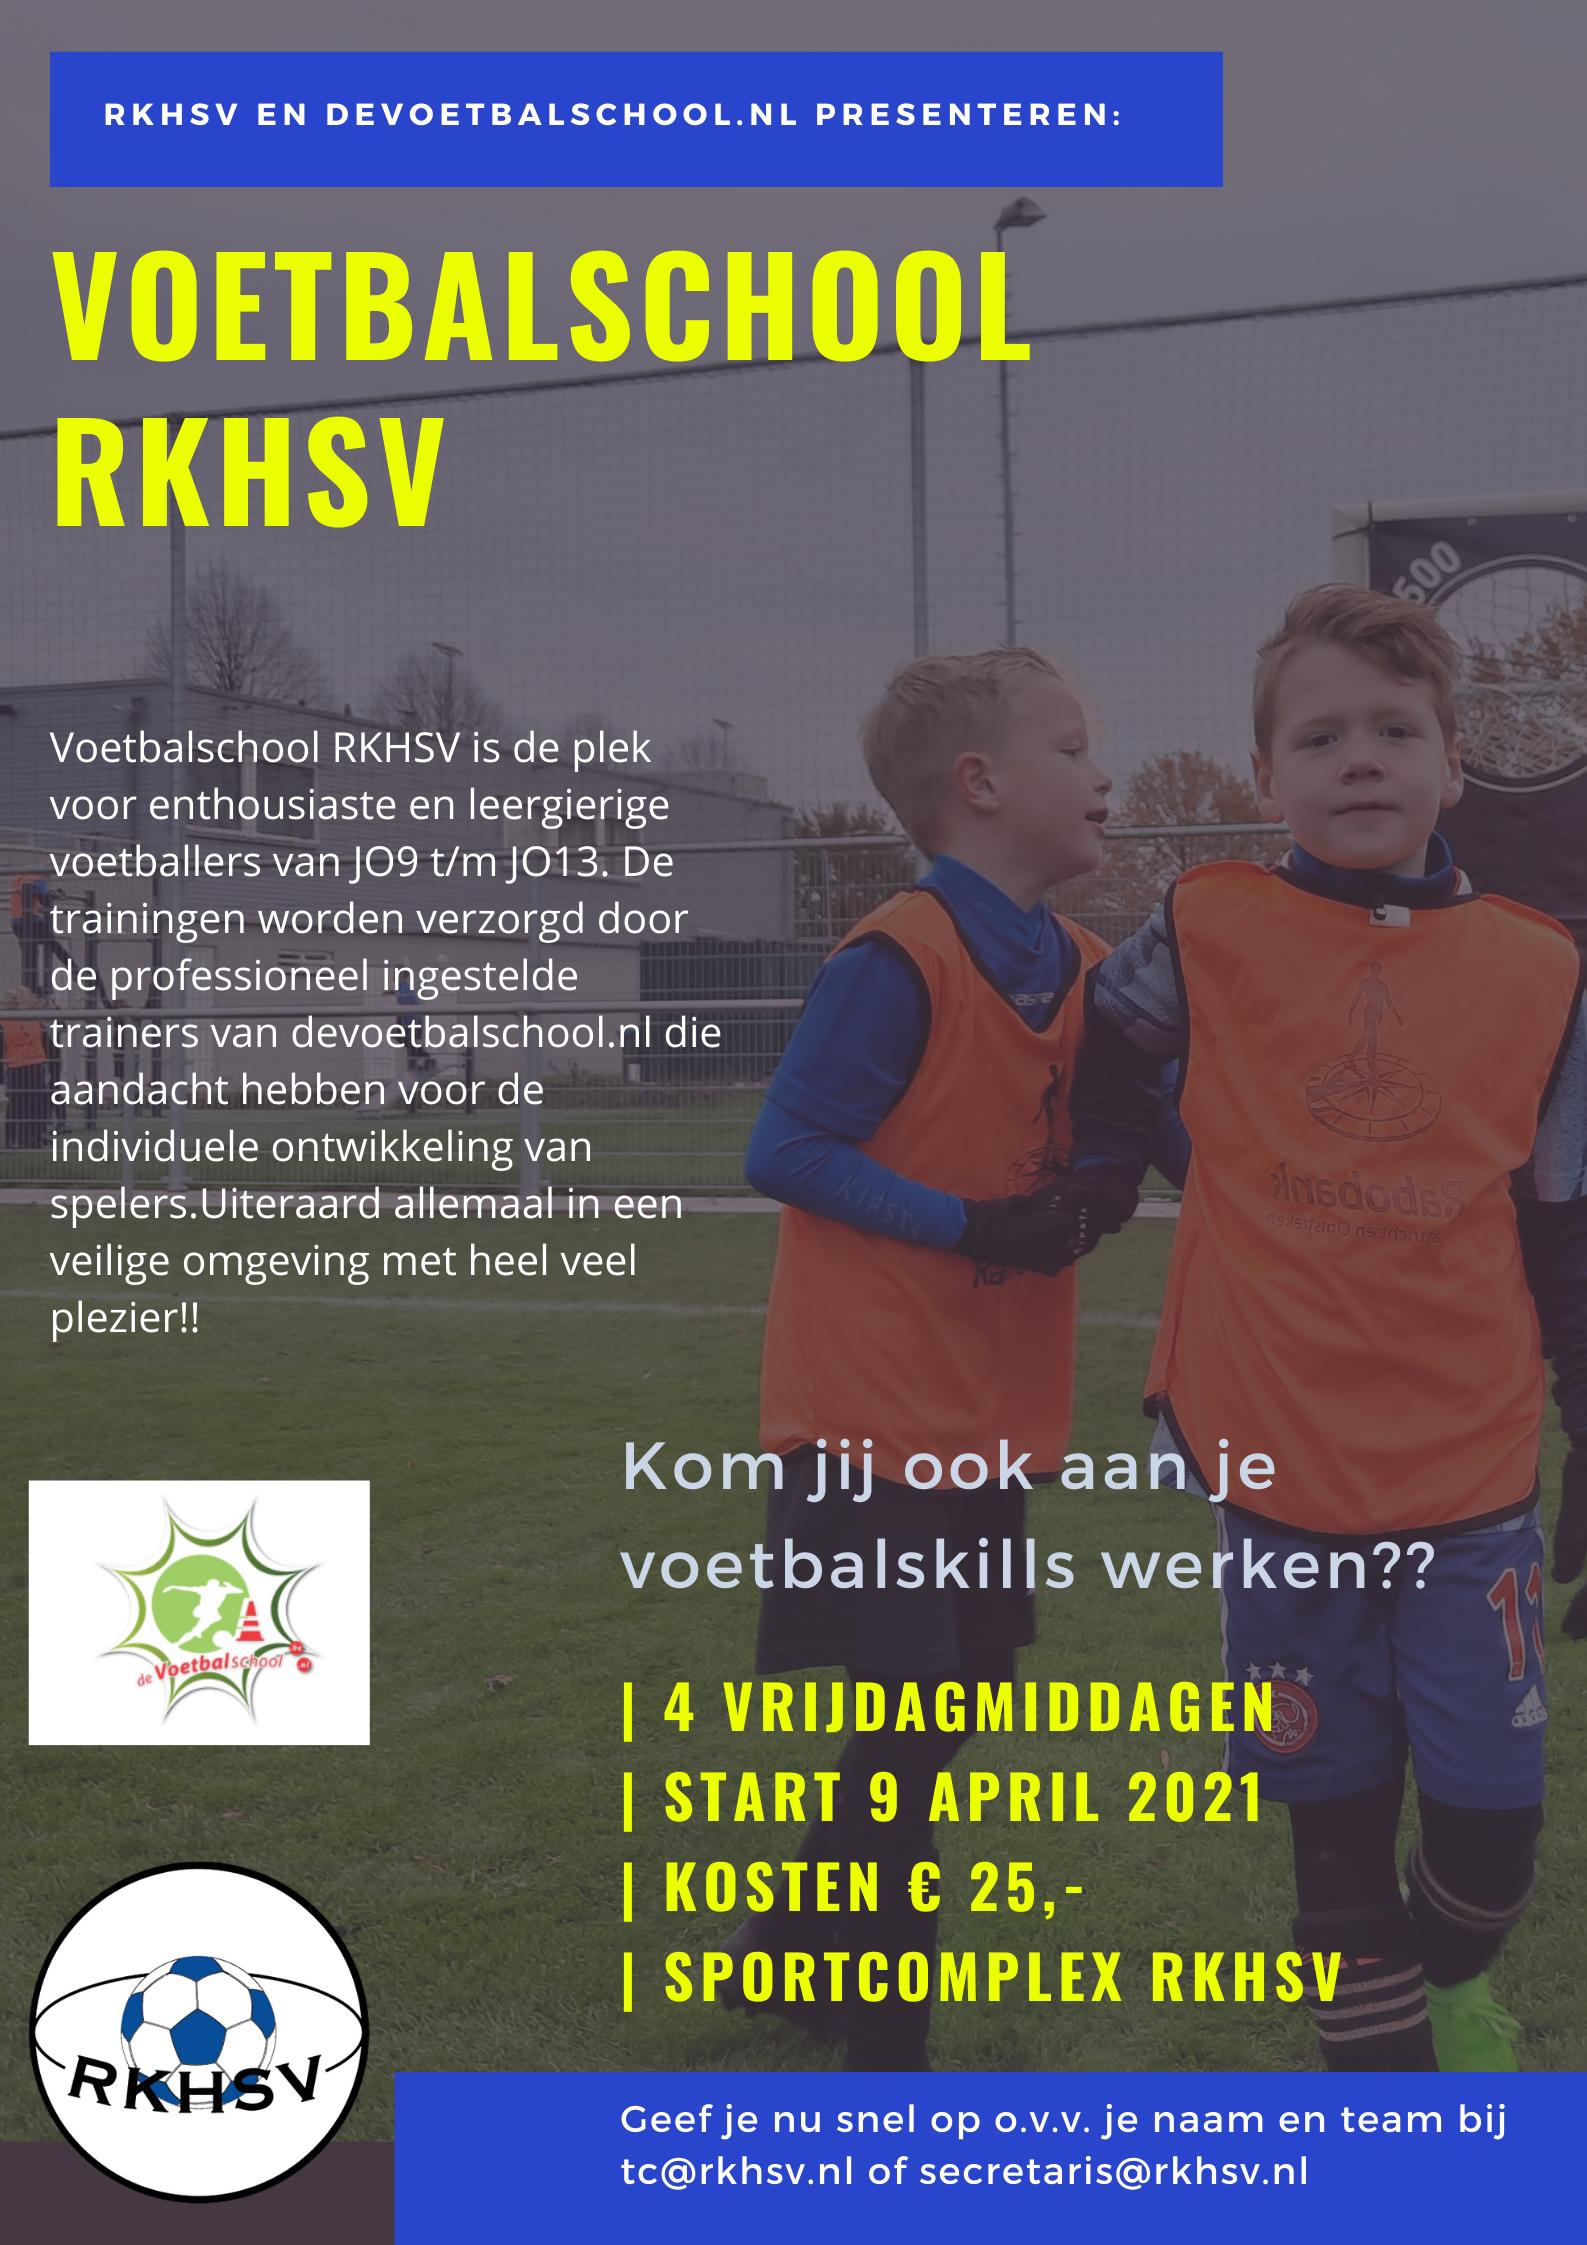 RKHSV Voetbalschool